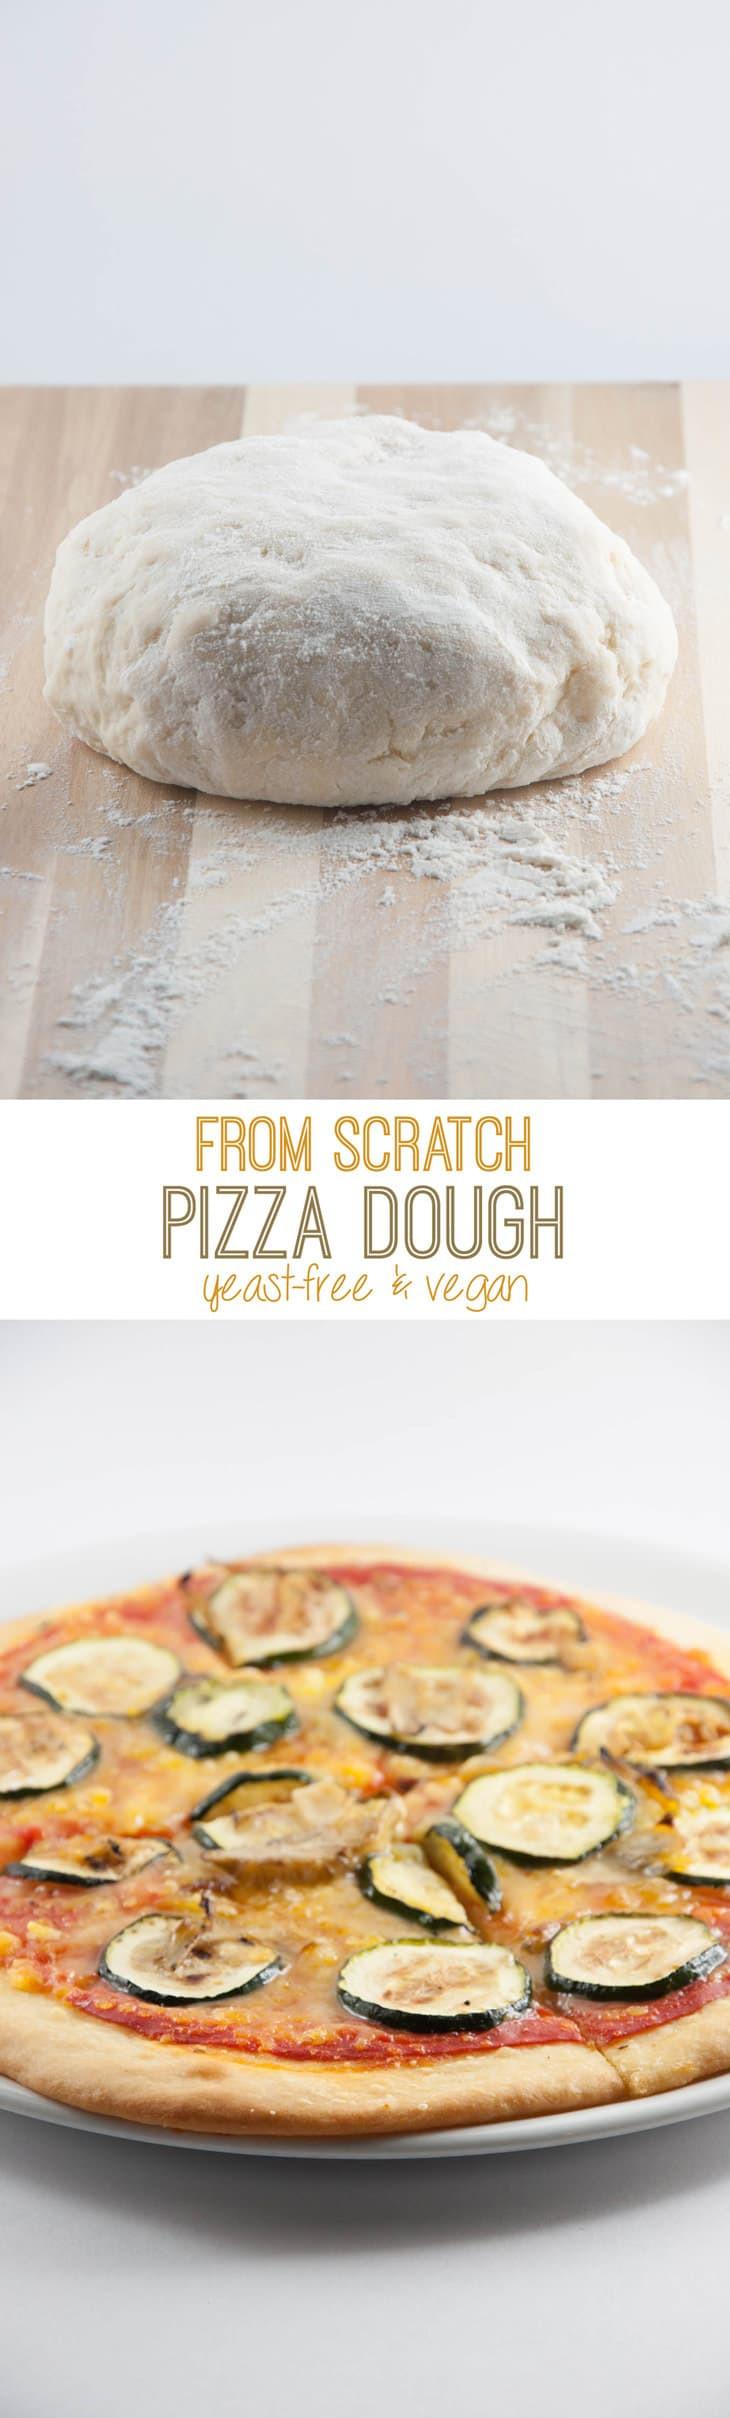 Yeast Free Pizza Dough  Yeast Free Vegan Pizza Dough veganpizzaparty